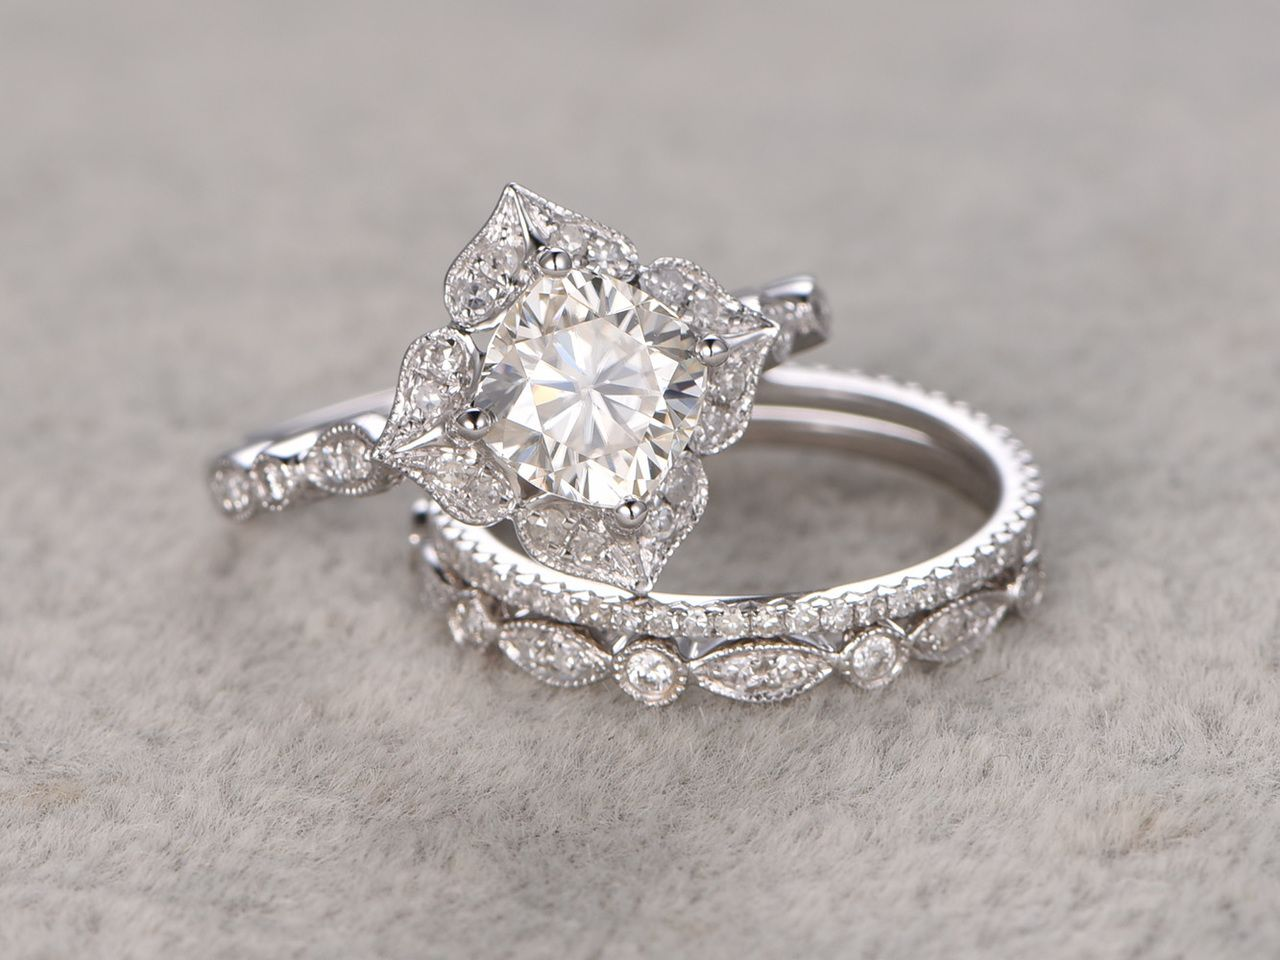 6mm Cushion Moissanite Wedding Set Diamond Bridal Ring 14k White Gold Halo Flora Moissanite Wedding Set Gold Diamond Wedding Band Antique Halo Engagement Rings